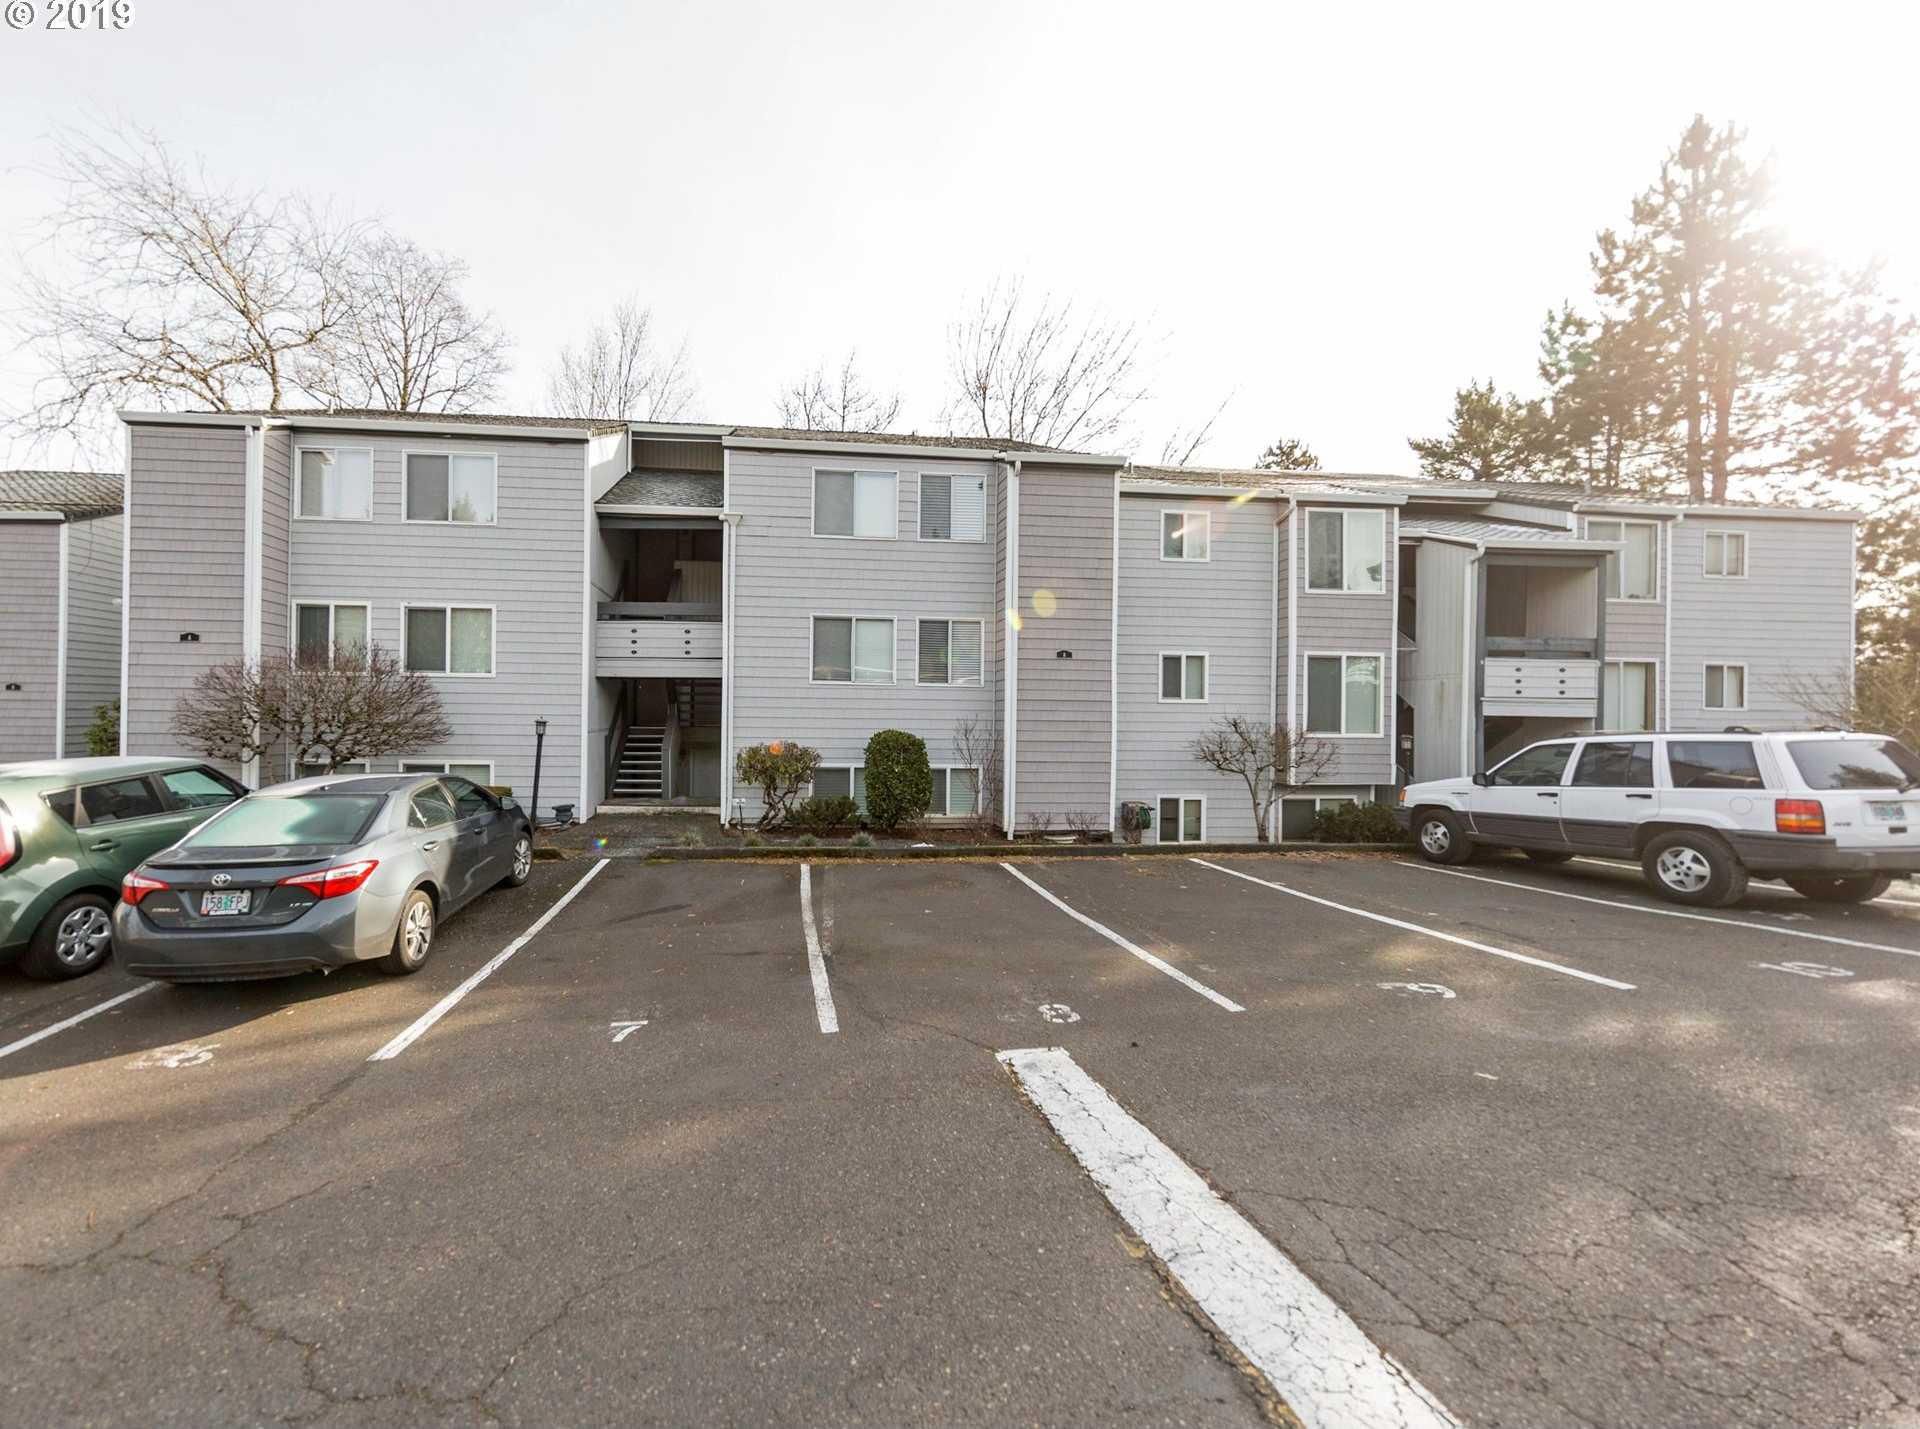 $207,000 - 2Br/1Ba -  for Sale in Ridgeview Condominiums, Lake Oswego